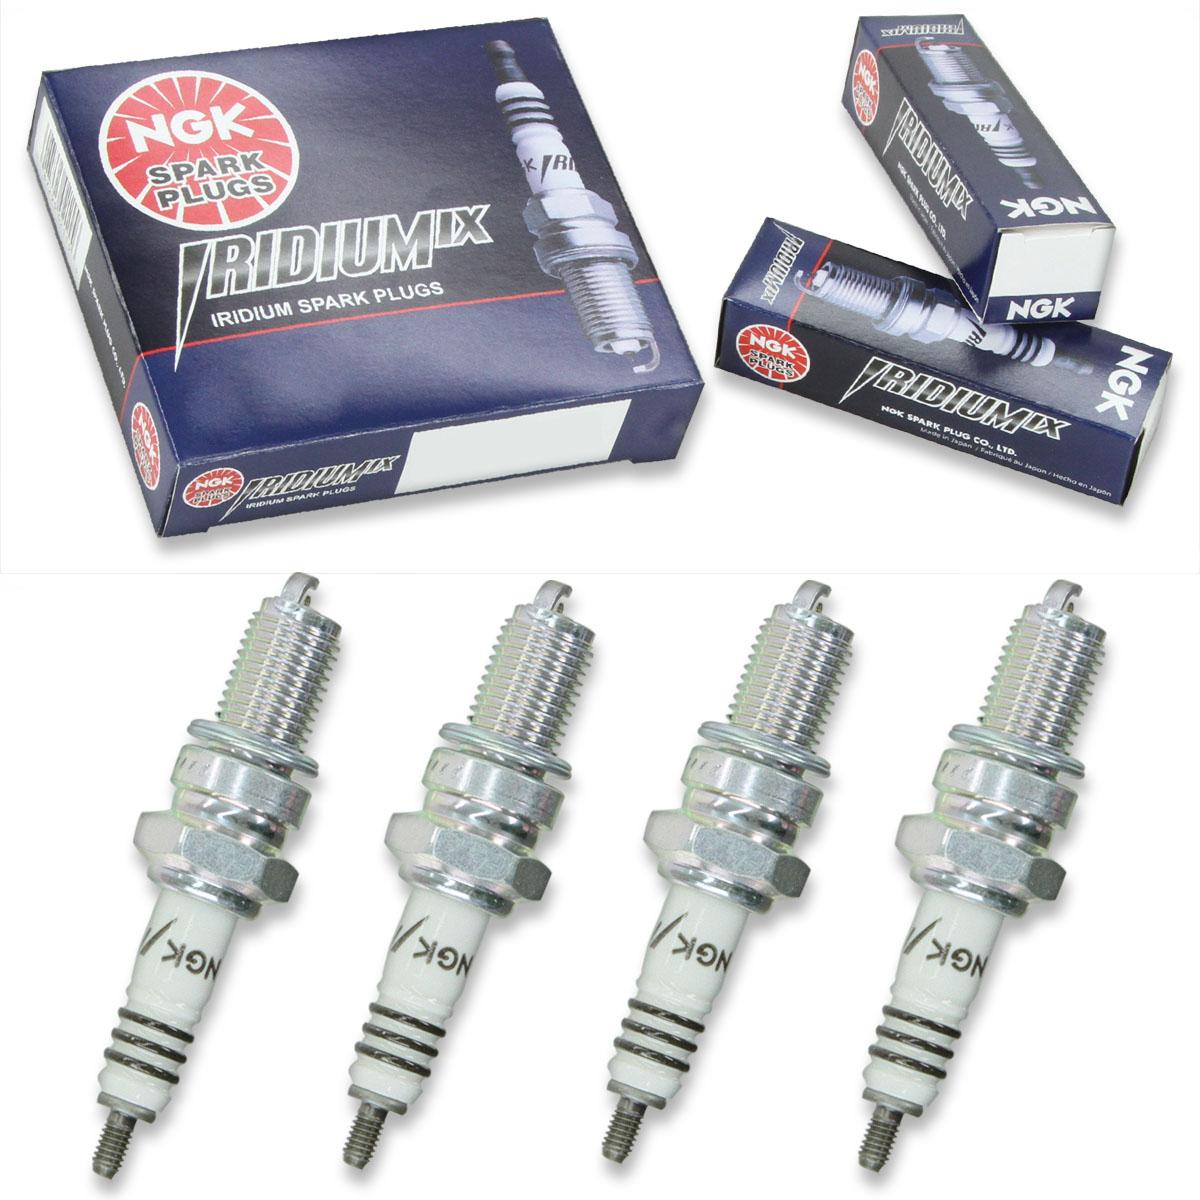 4pcs 82-97 Honda CR125 NGK Standard Spark Plugs 125 Kit Set Engine zd